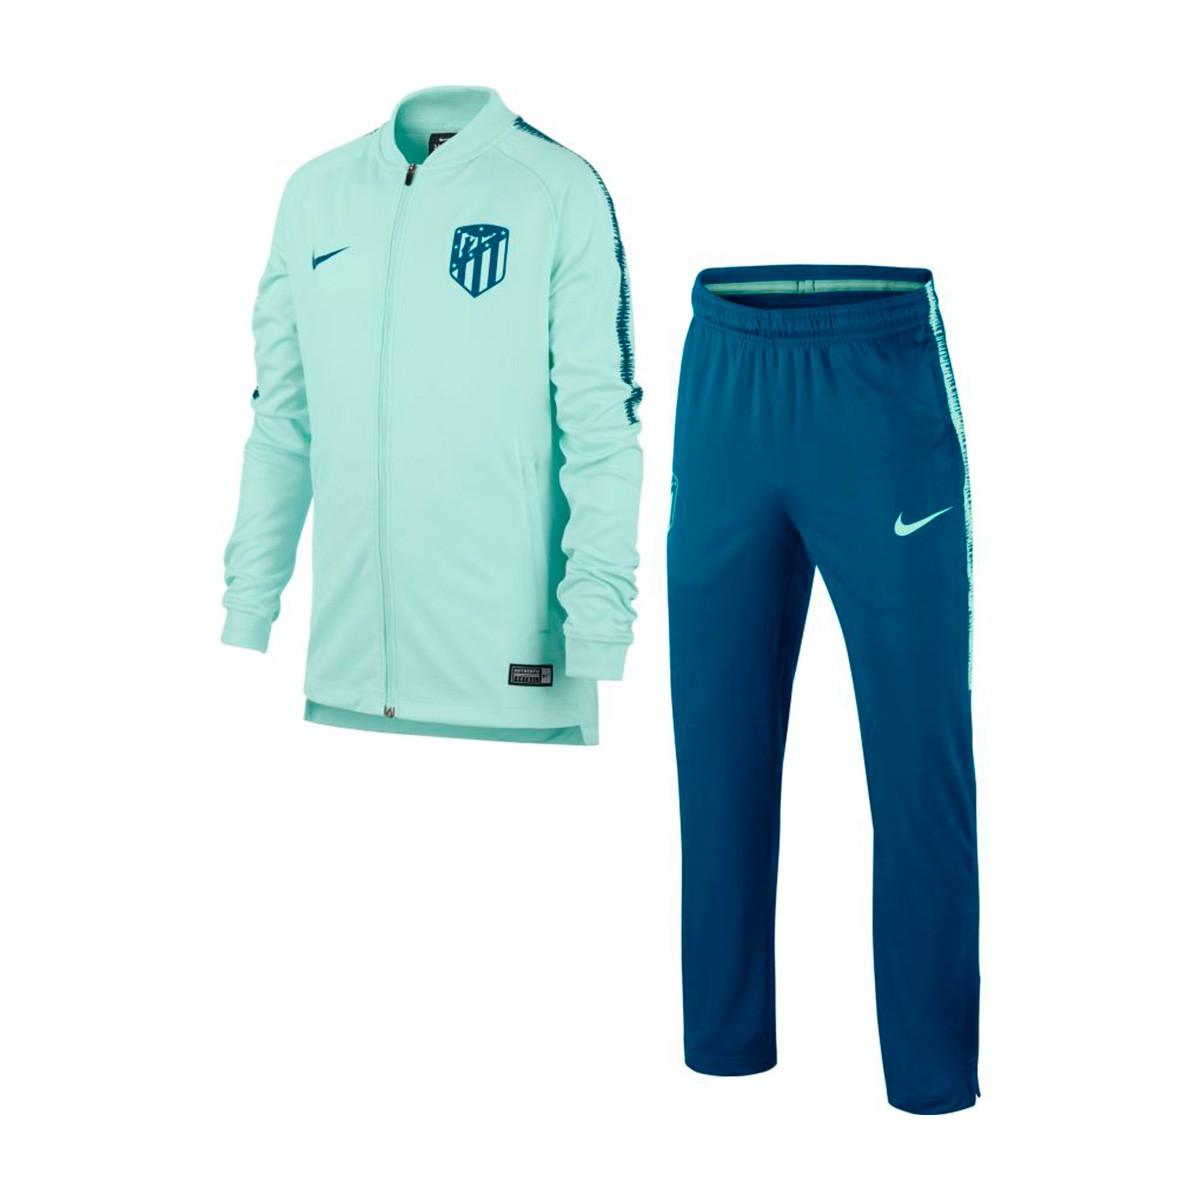 d5391879fc7ef Chándal Nike Atlético de Madrid Squad 2018-2019 Niño Igloo-Green abyss -  Tienda de fútbol Fútbol Emotion